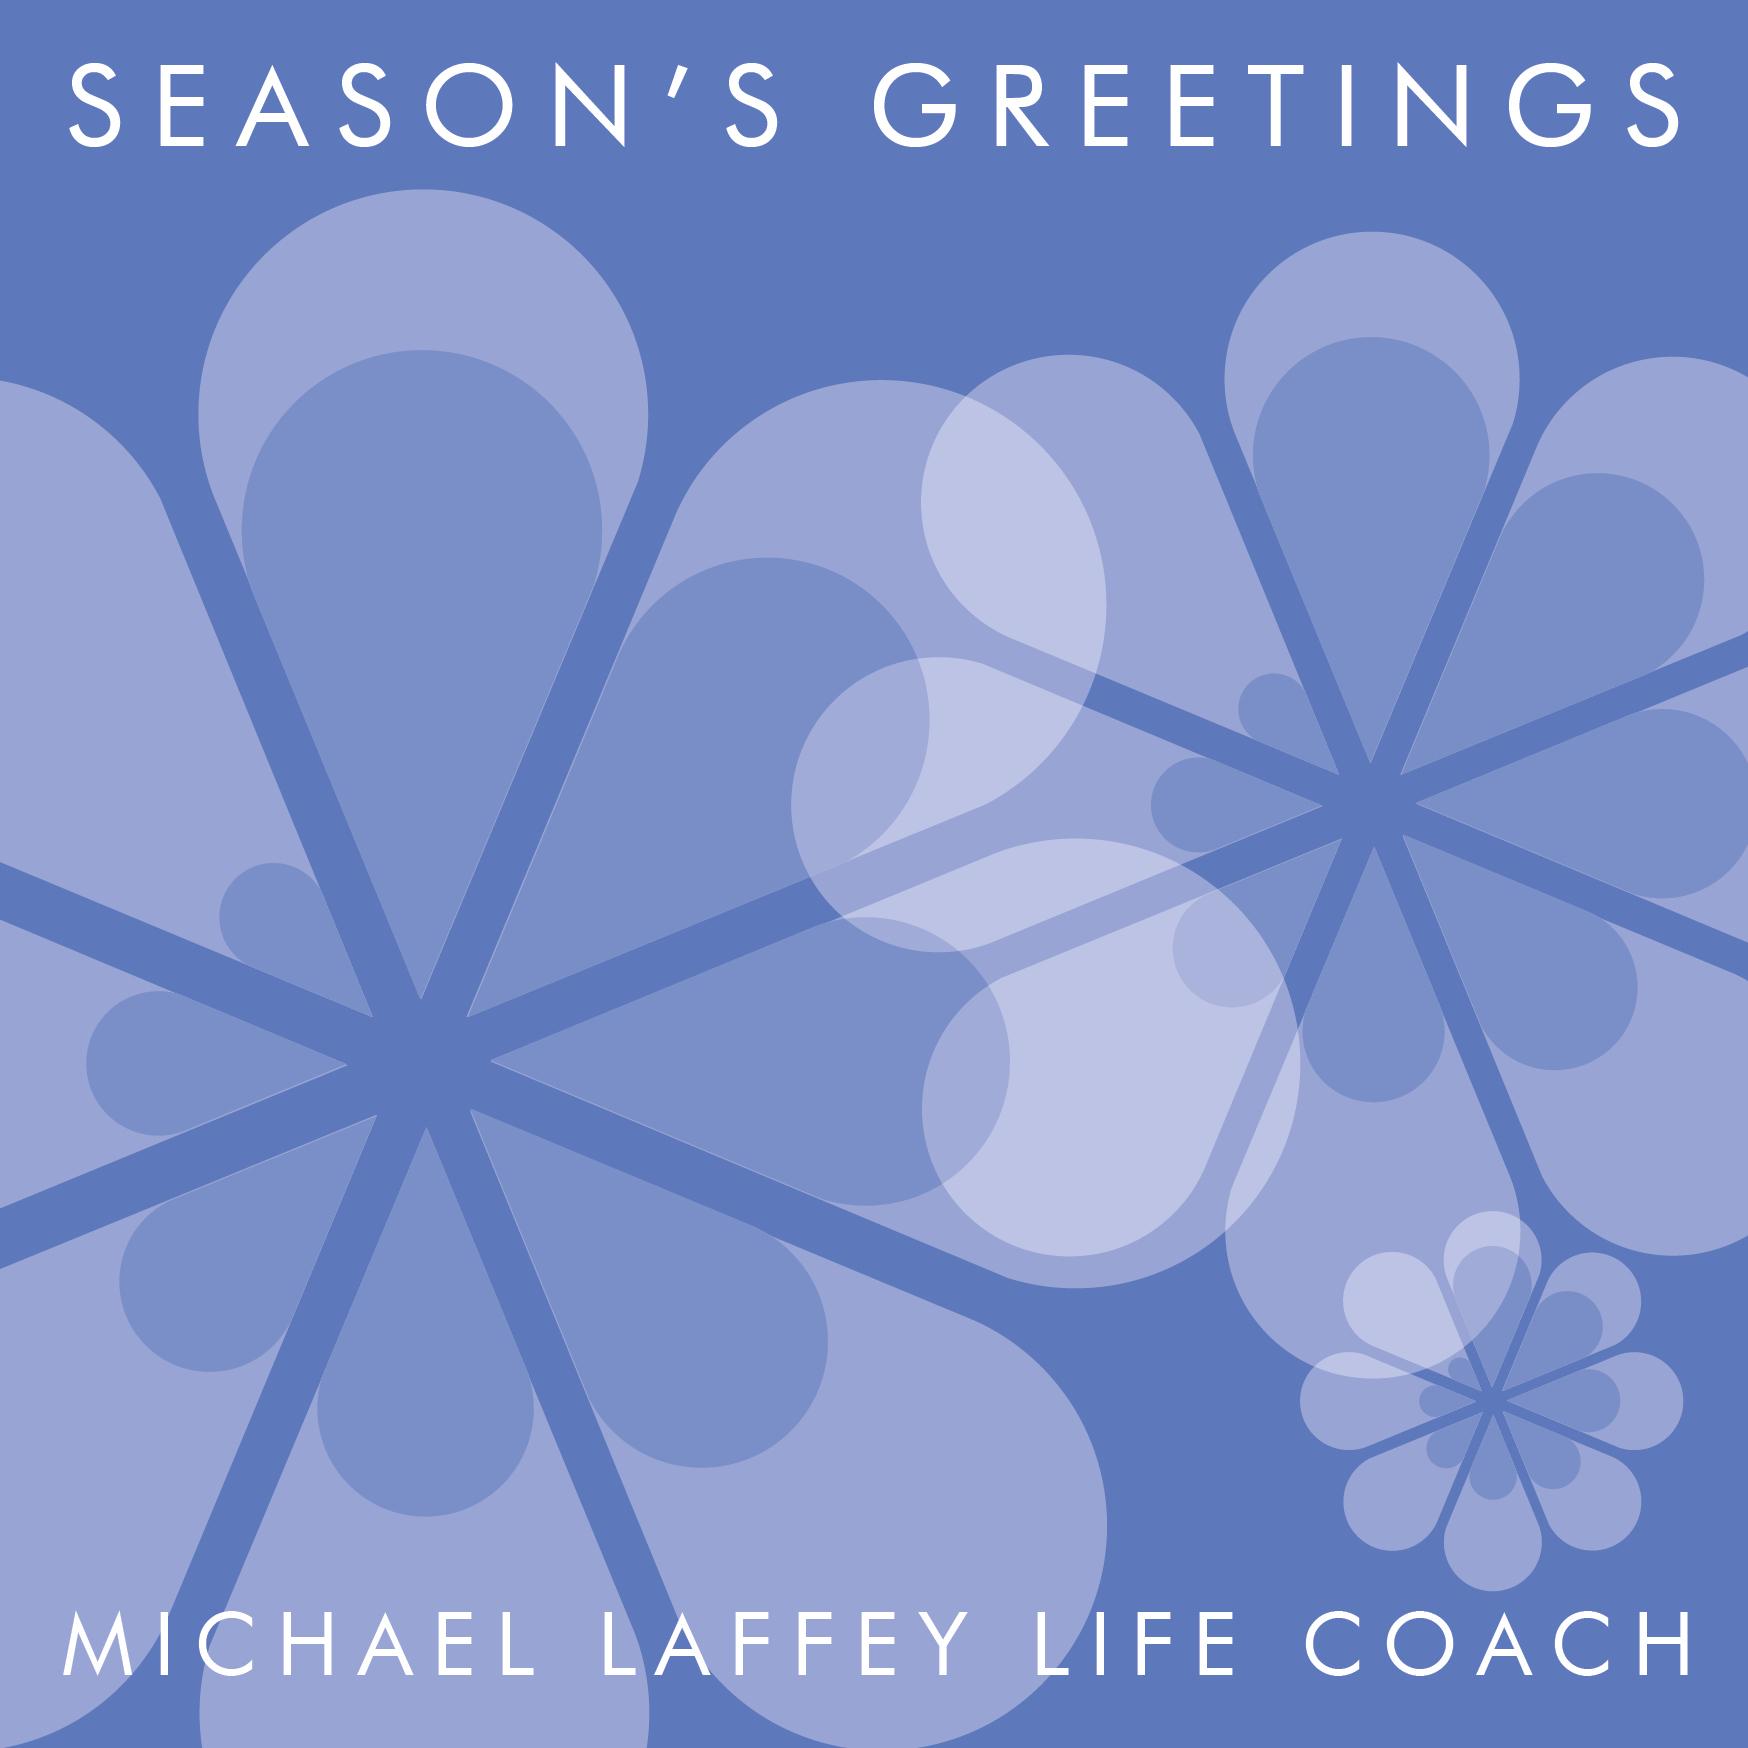 michael laffey life coach, michael laffey. wheel of life, 2017, itunes app, yearly review